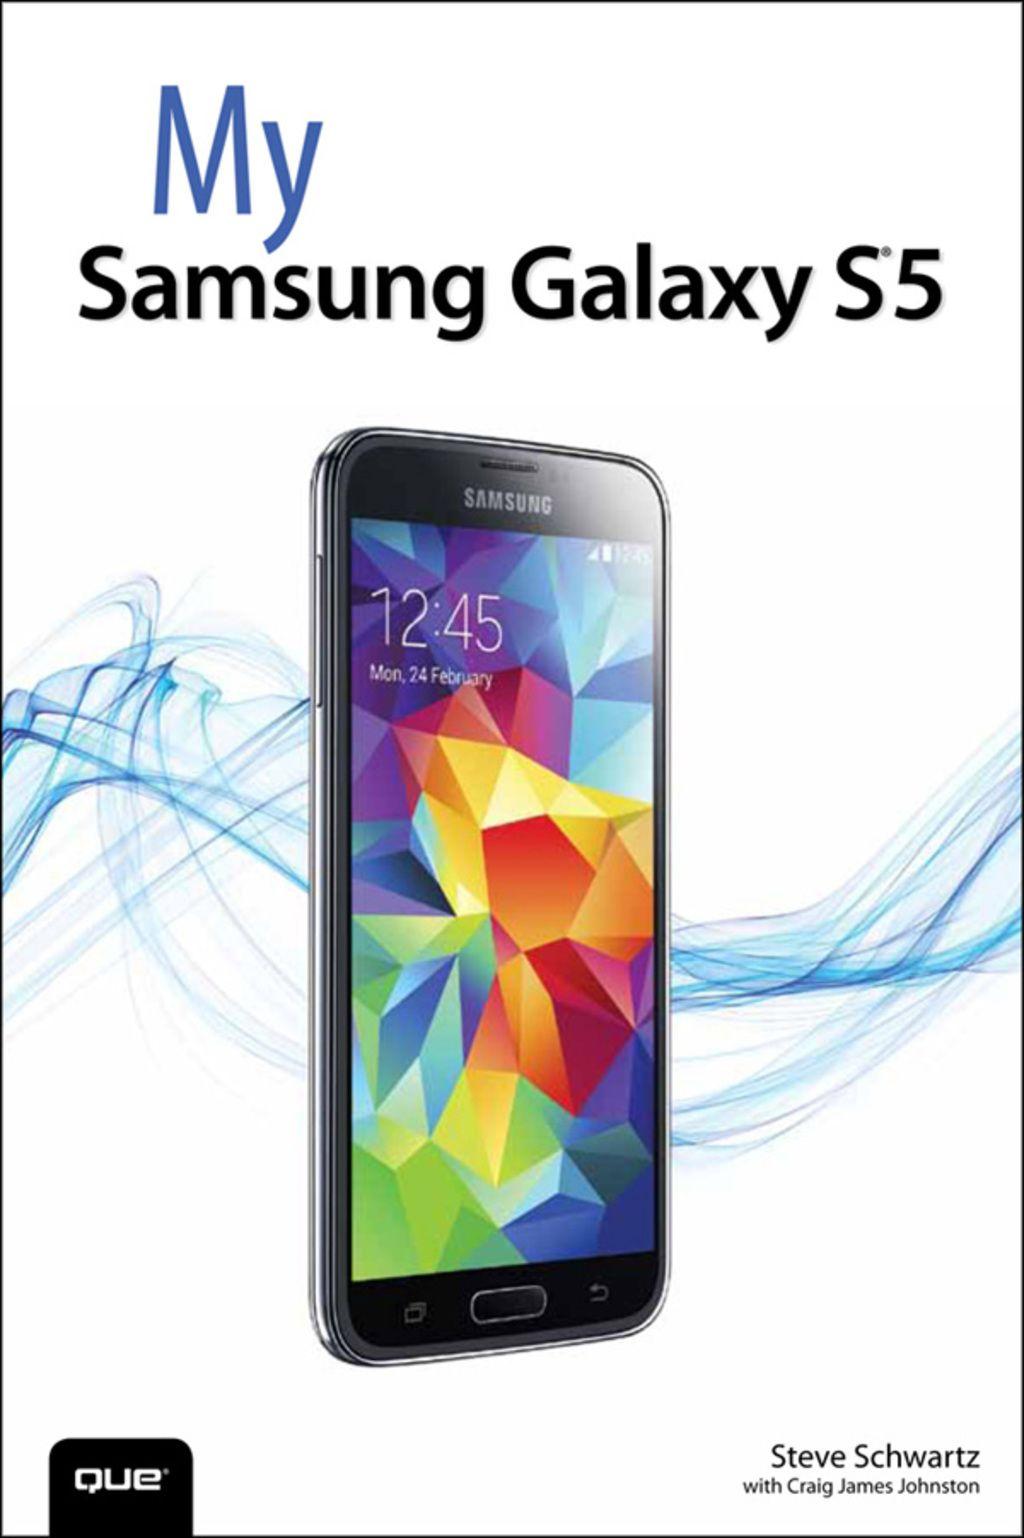 My Samsung Galaxy S5 (eBook) in 2019 Samsung galaxy s5